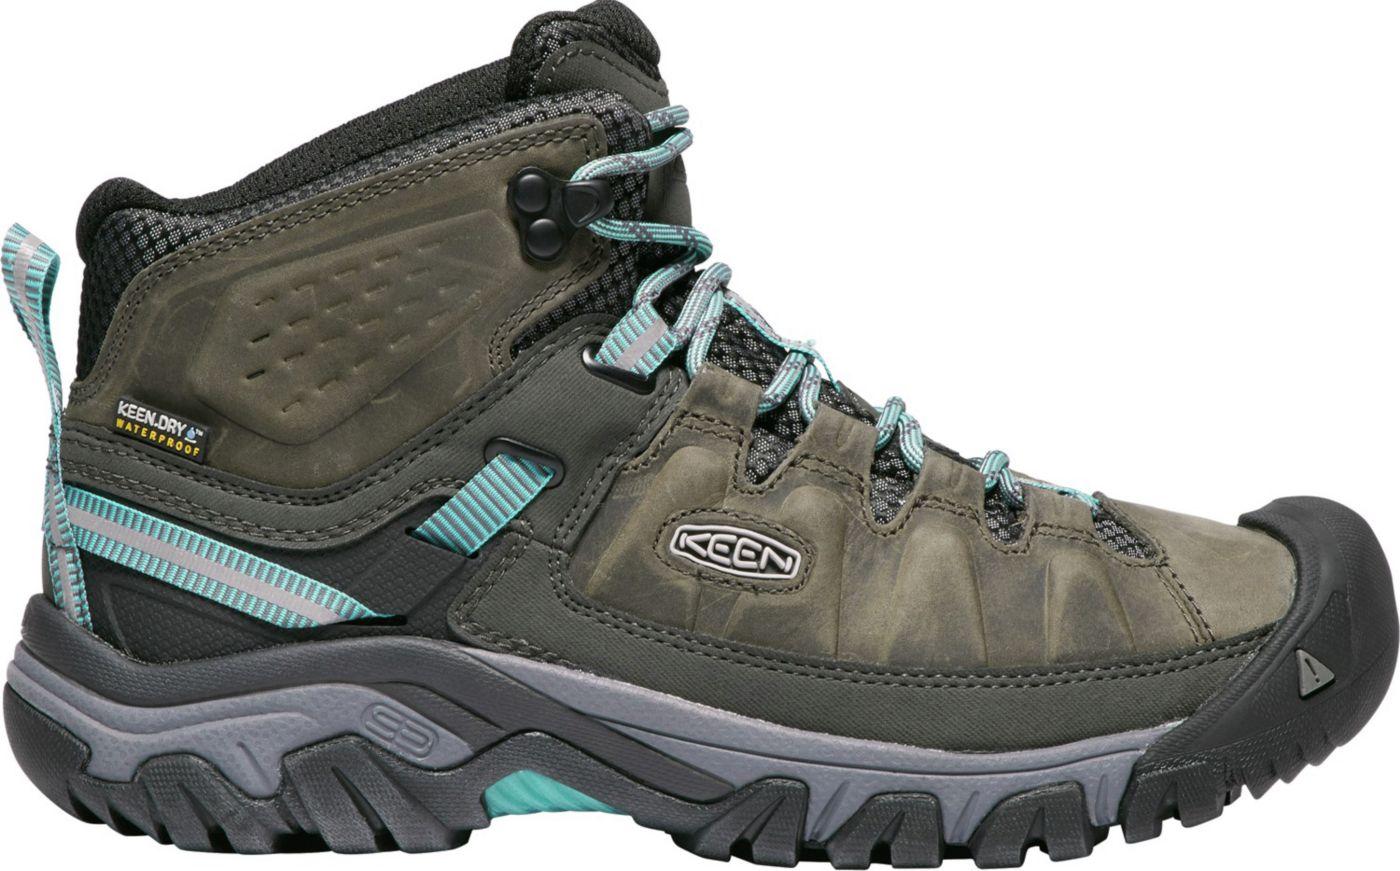 KEEN Women's Targhee III Mid Waterproof Hiking Boots